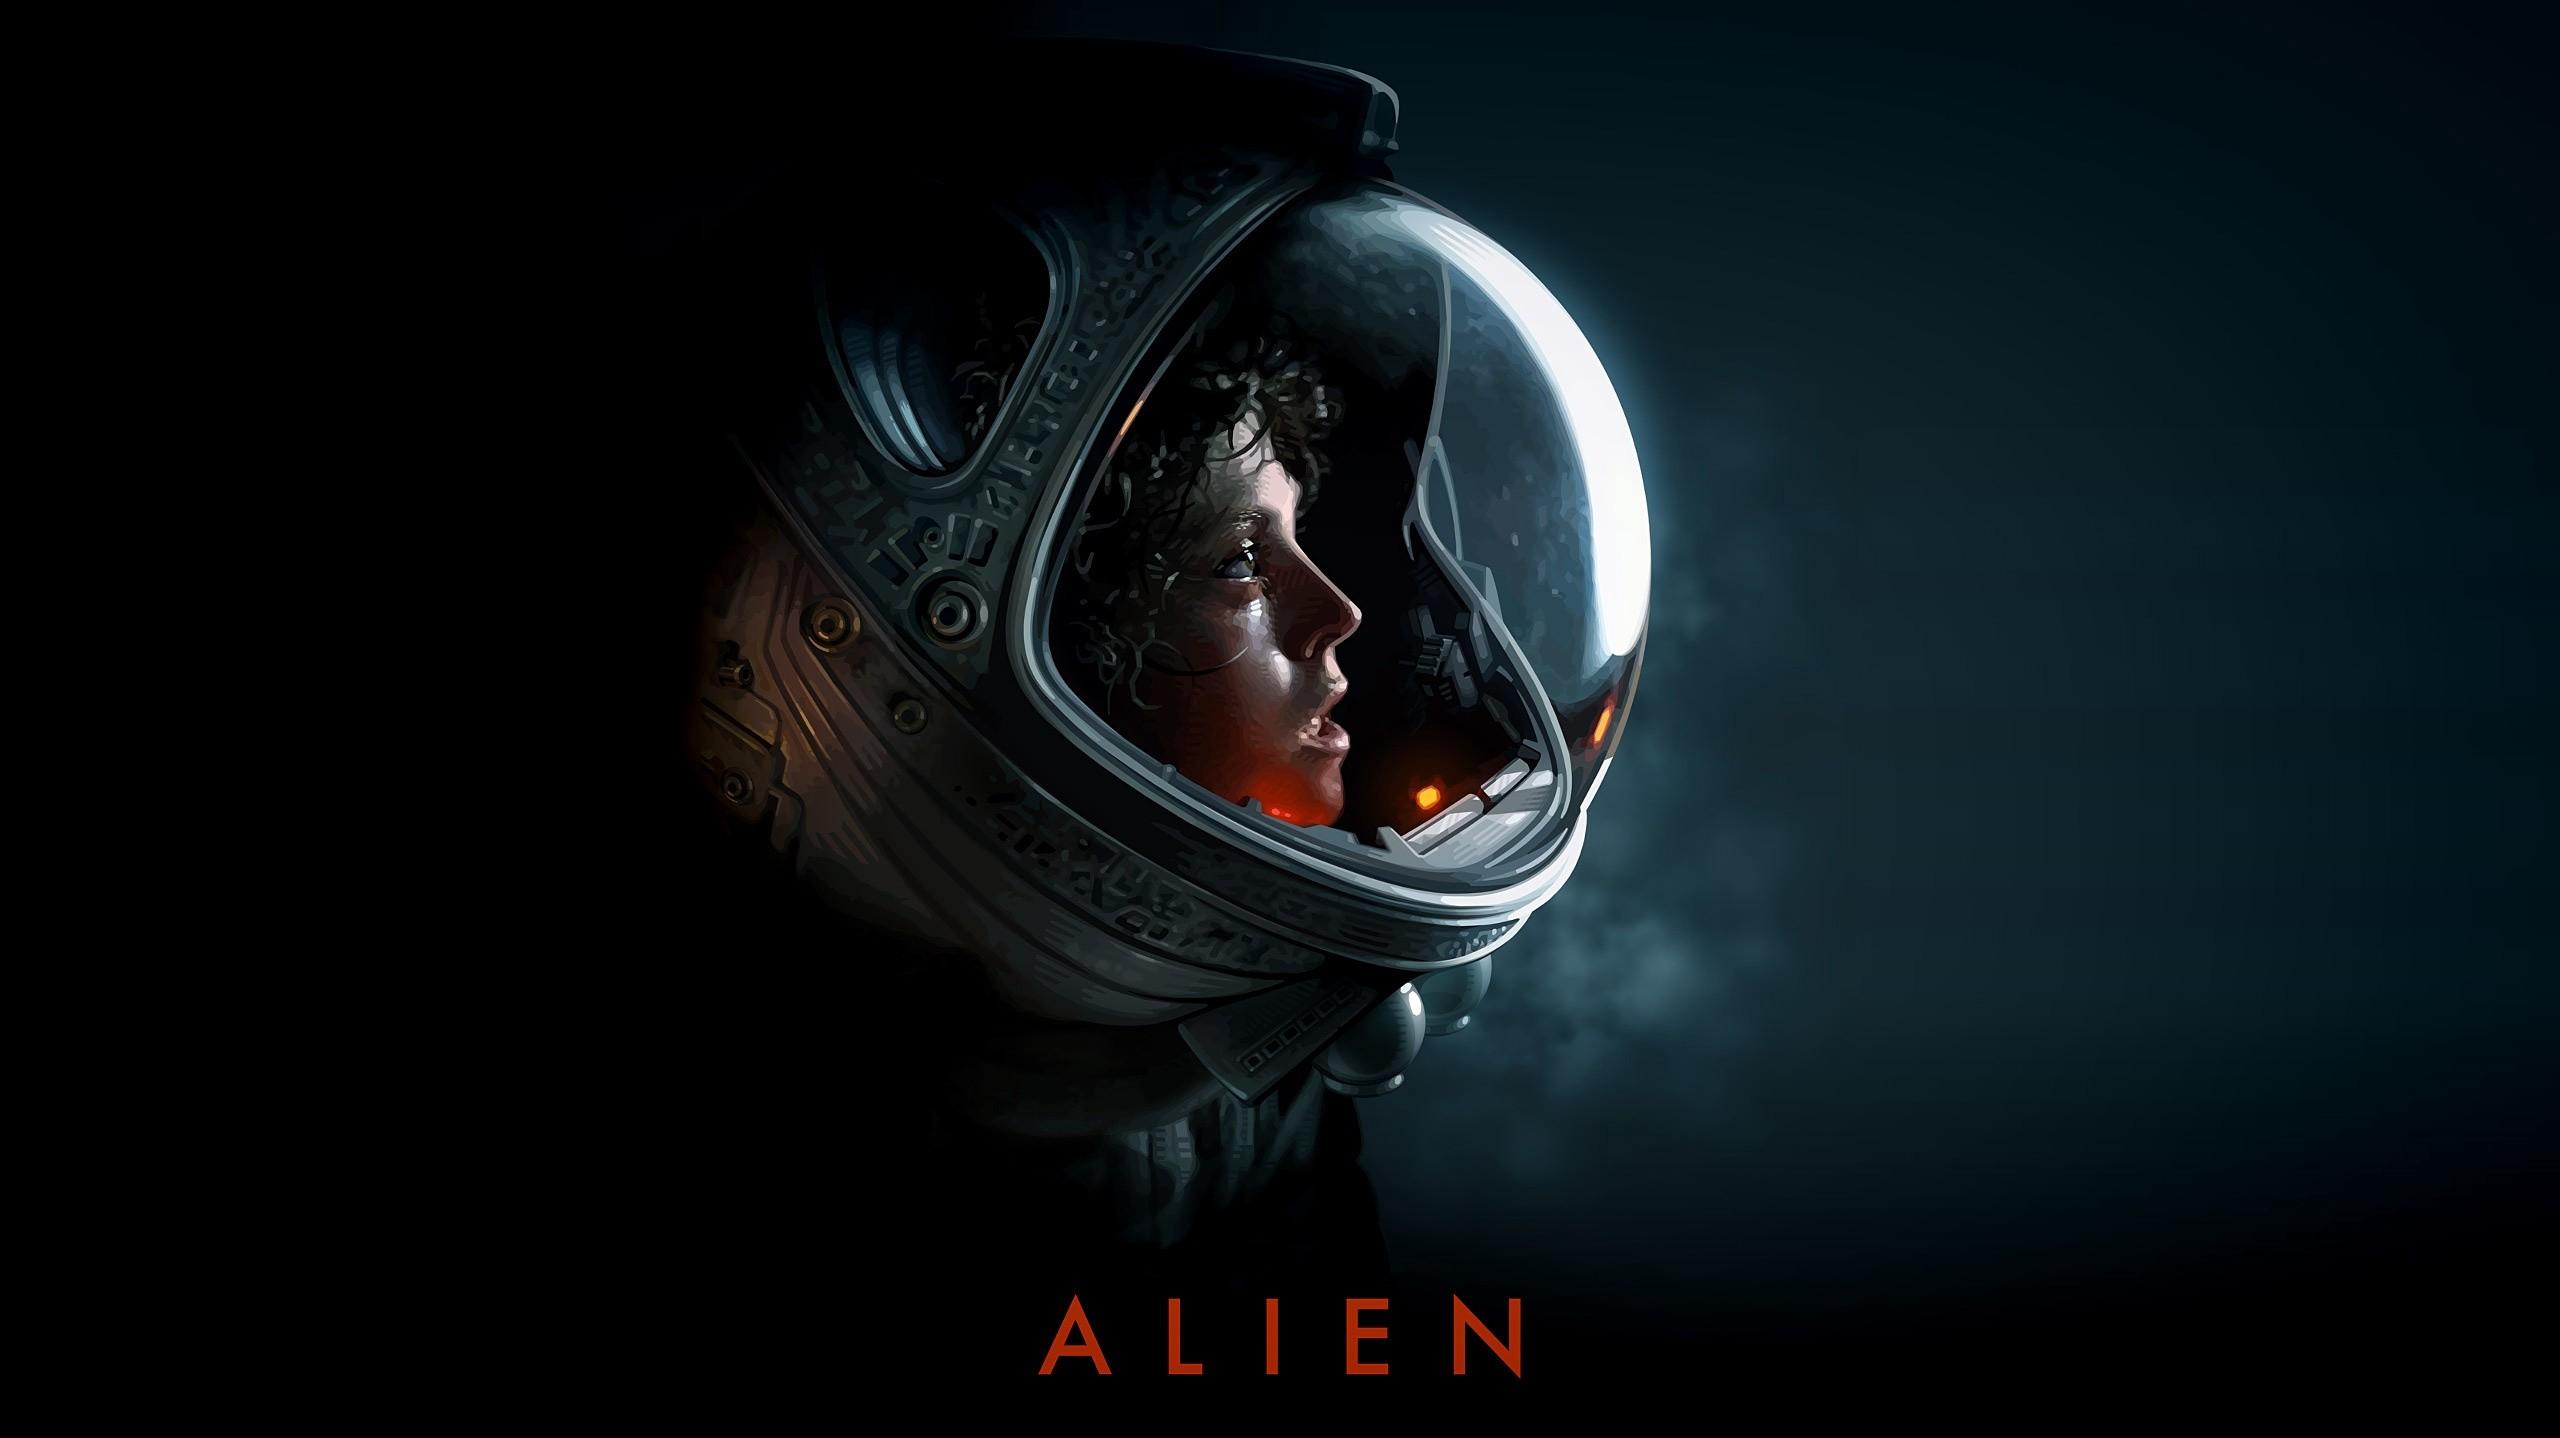 artwork science fiction Xenomorph Alien movie space suit Ellen Ripley Sigourney Weaver darkness screenshot computer wallpaper